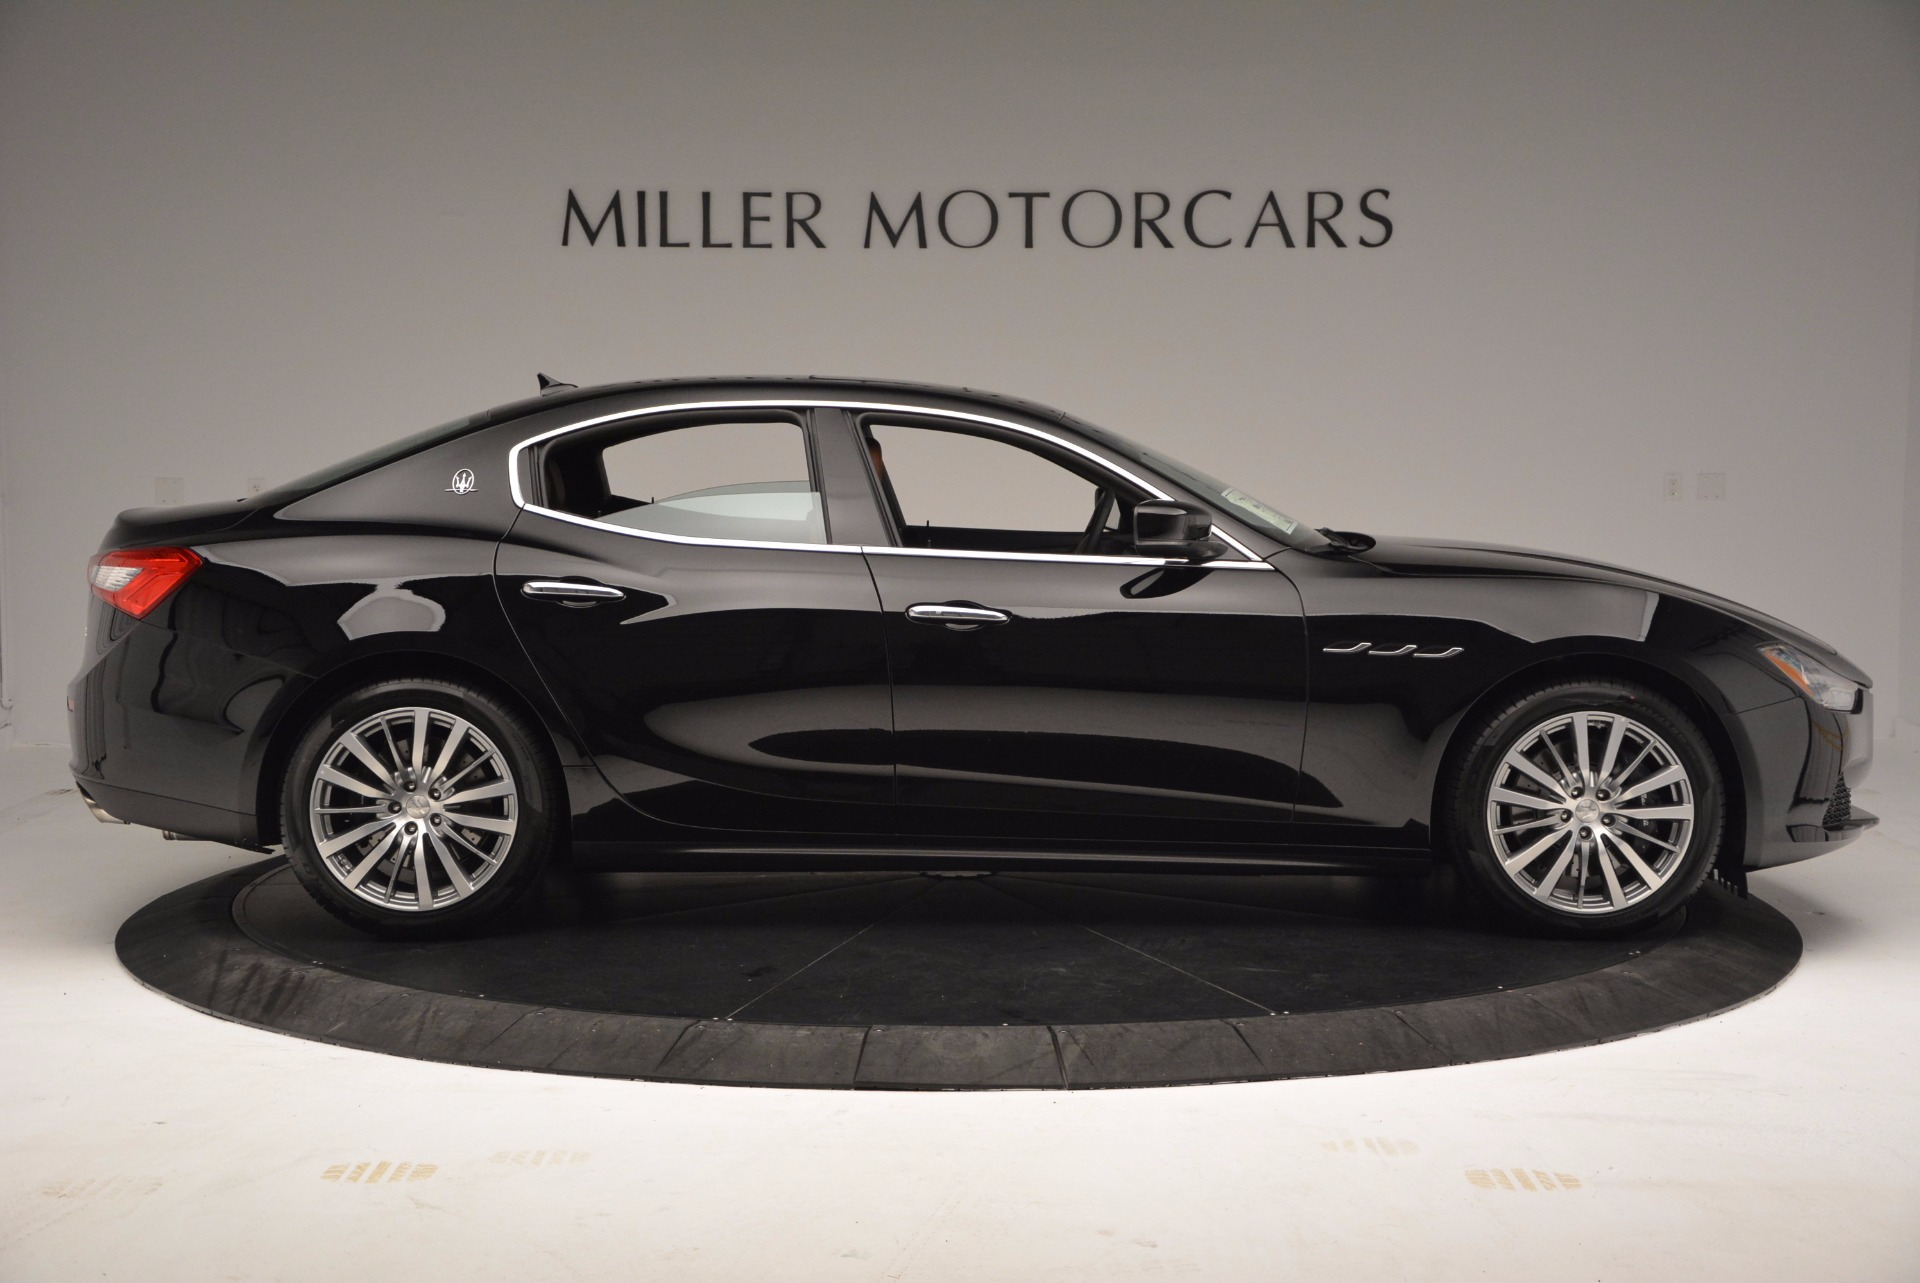 New 2017 Maserati Ghibli S Q4 EX-Loaner For Sale In Greenwich, CT 1116_p9